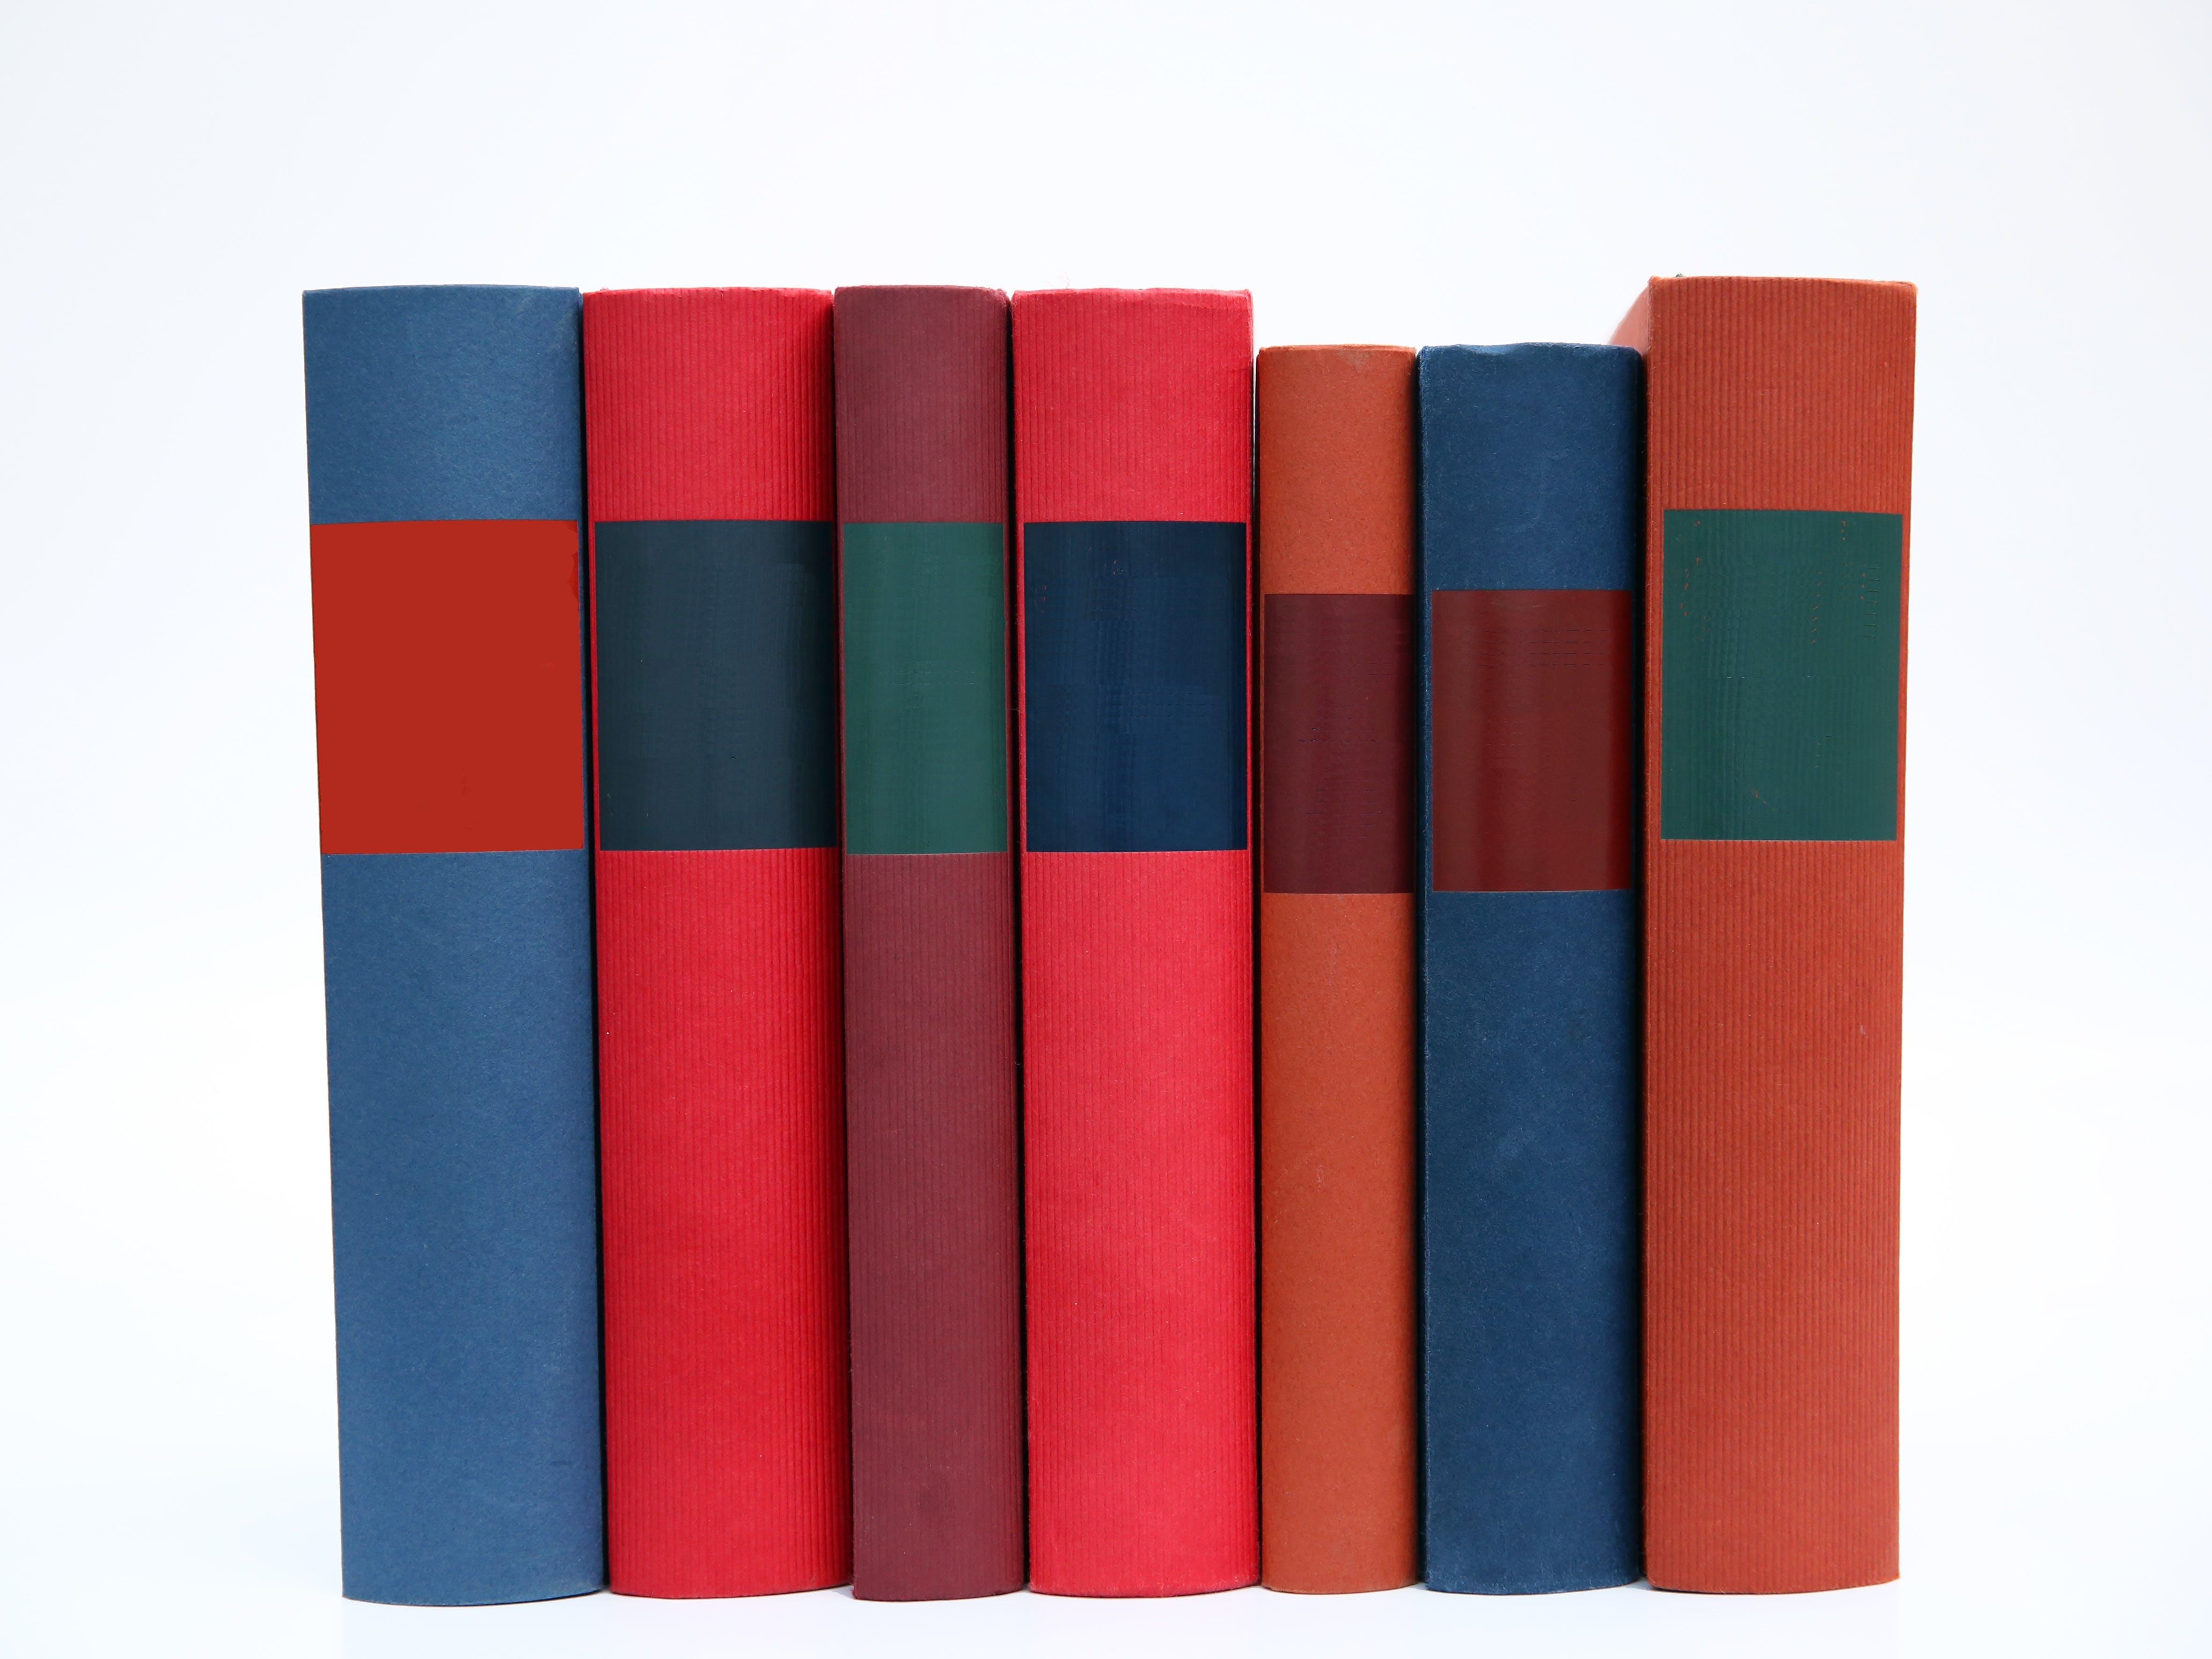 Piled Books